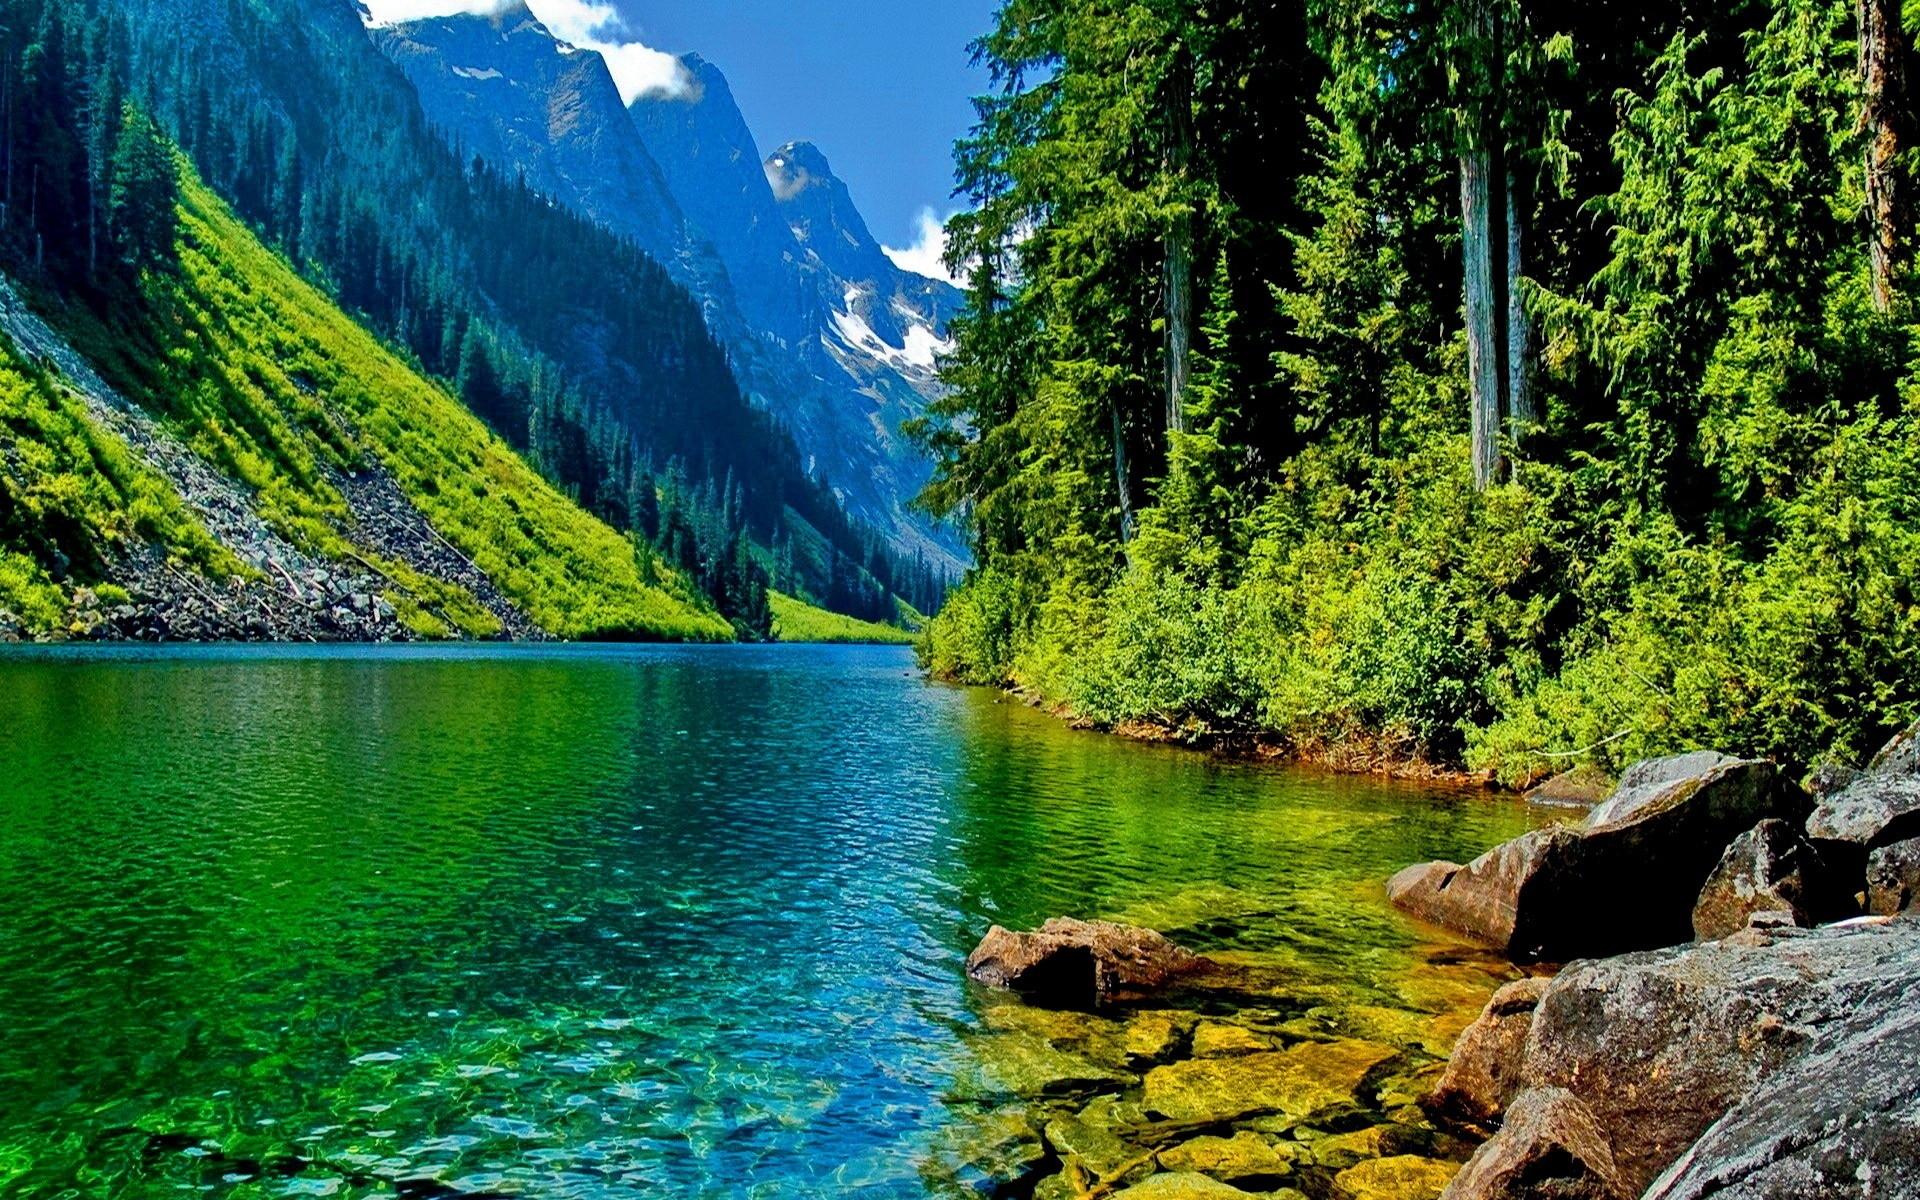 landscape mountain river hd desktop wallpaper download this wallpaper 1920x1200